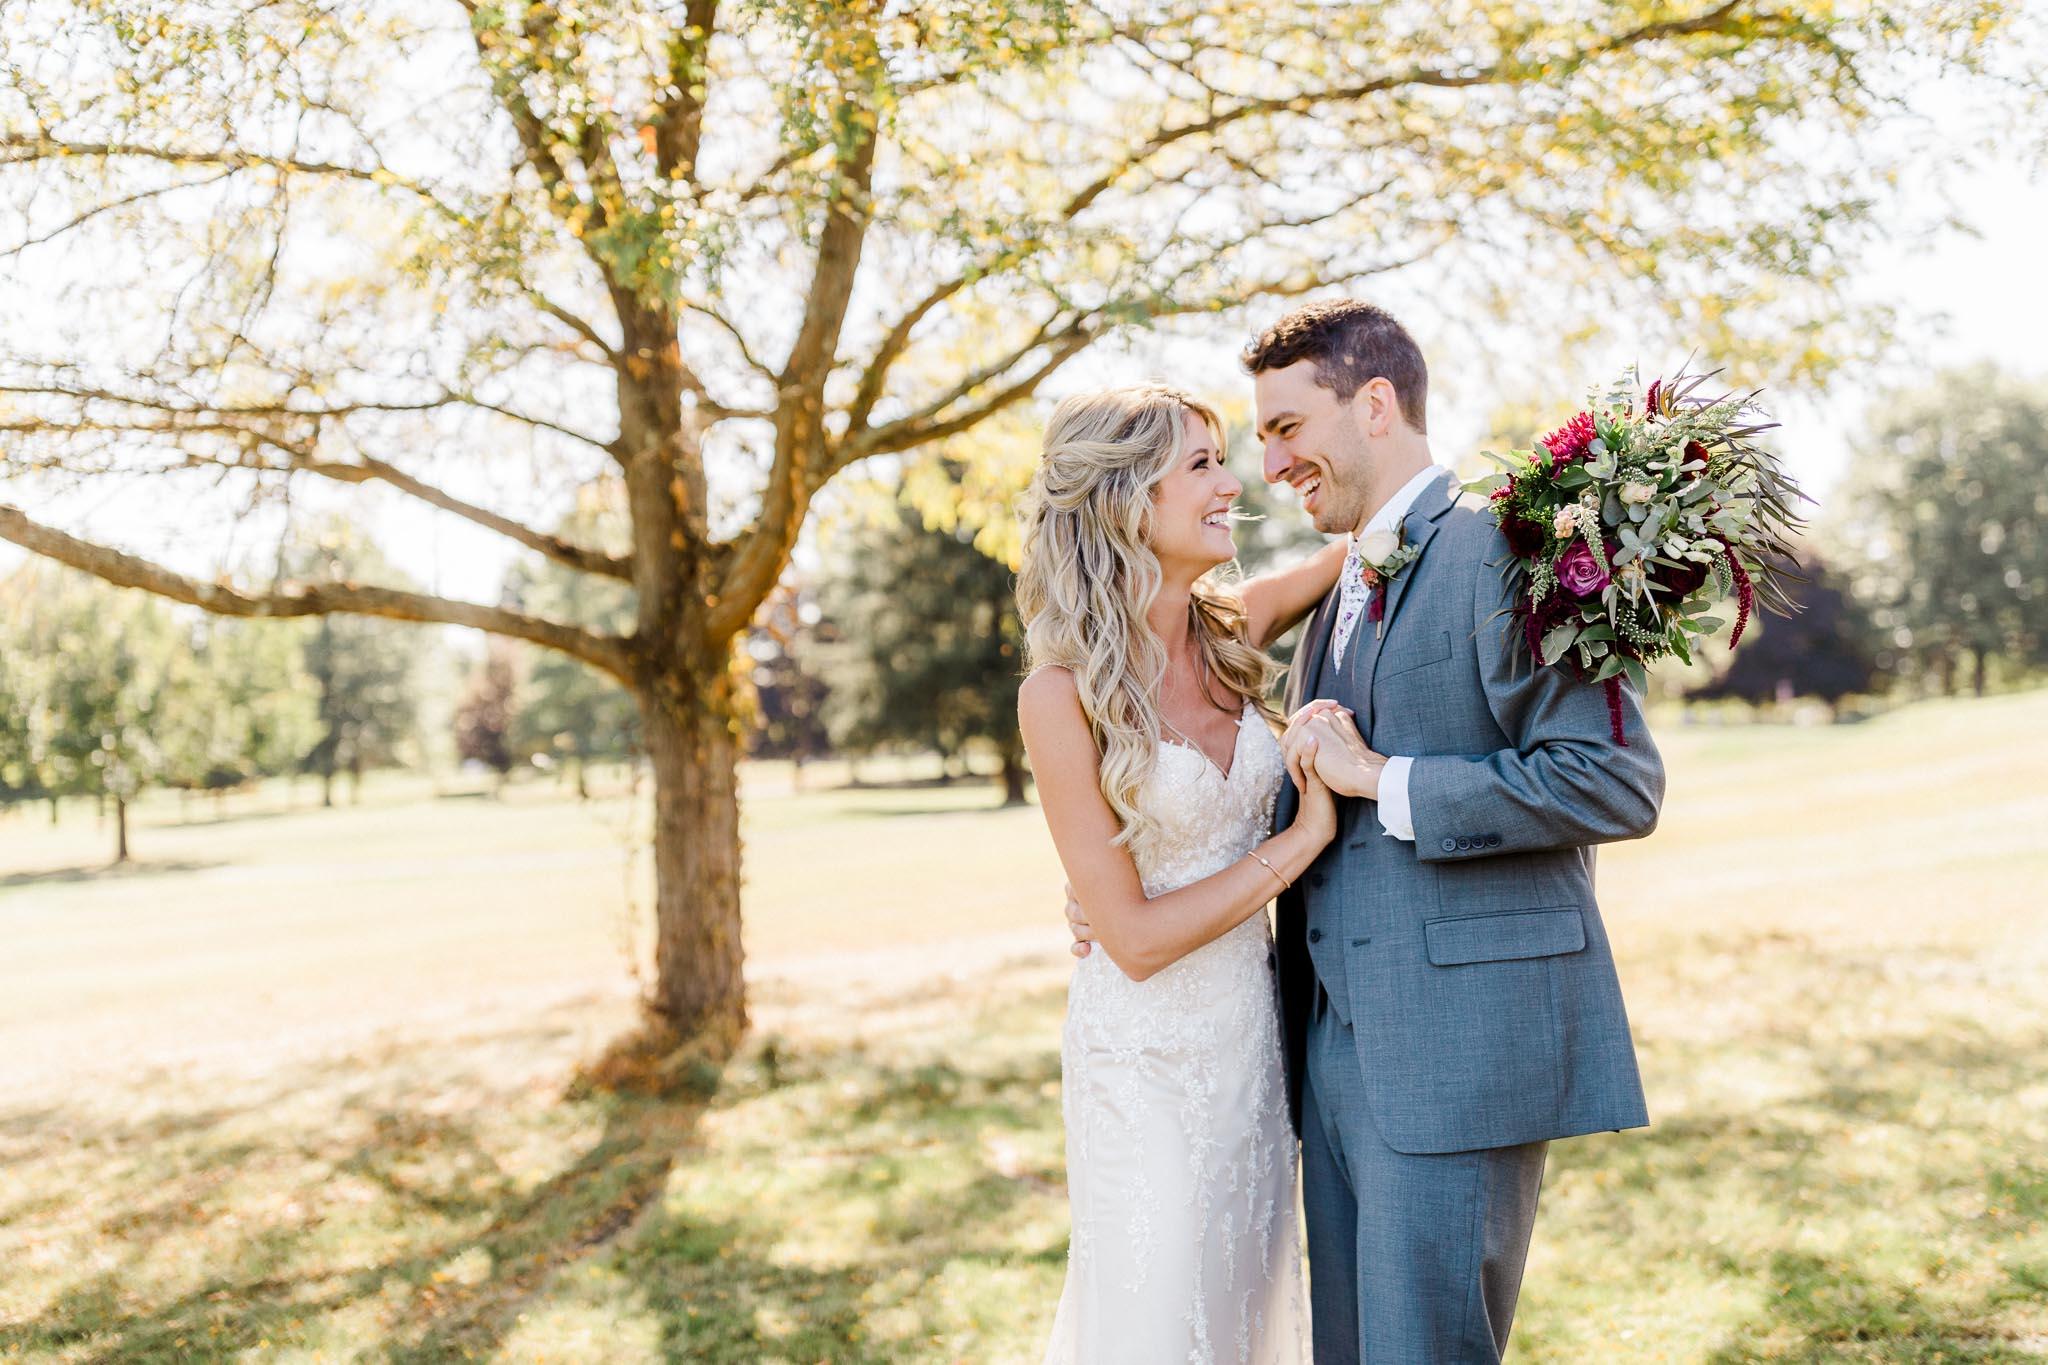 Frosty-Valley-September-Wedding-7628.jpg